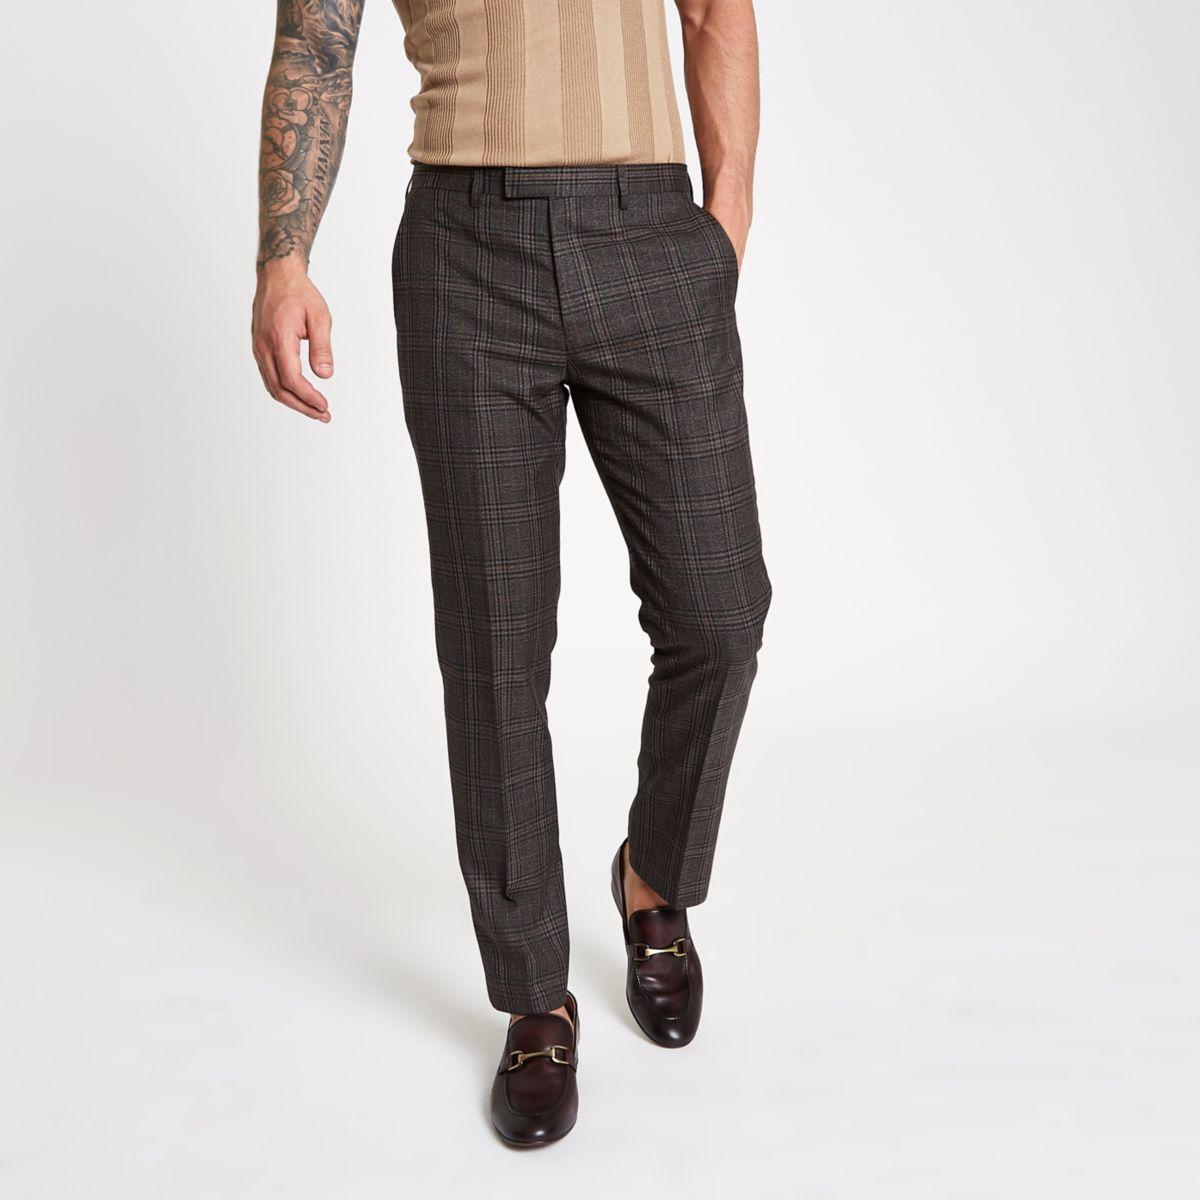 Brown check slim fit suit pants